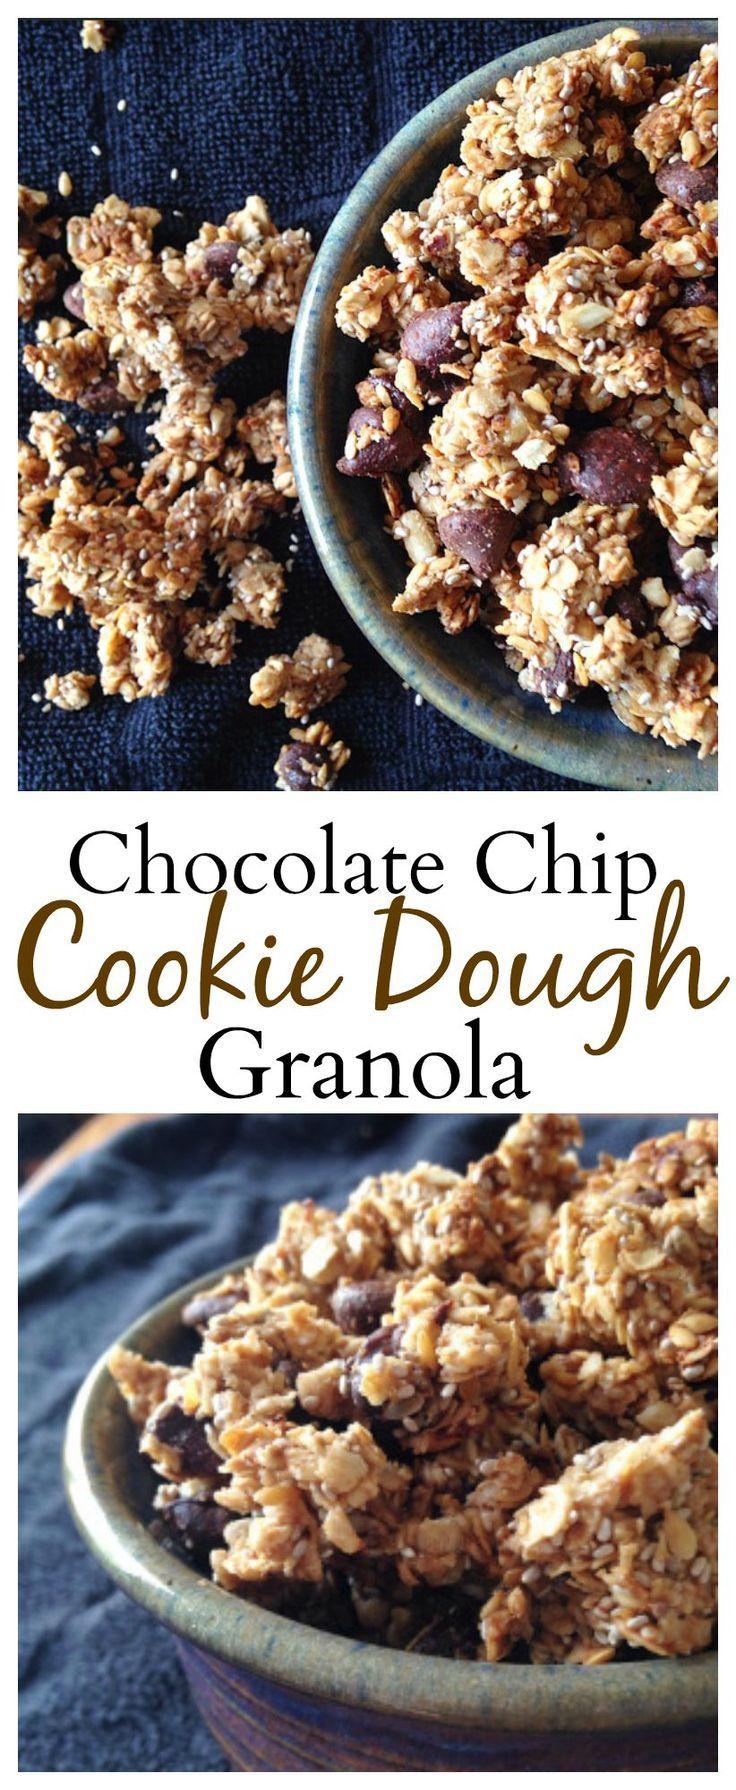 #healthy Chocolate Chip Cookie Dough Granola is the best granola you will ever taste! #vegan #glutenfree